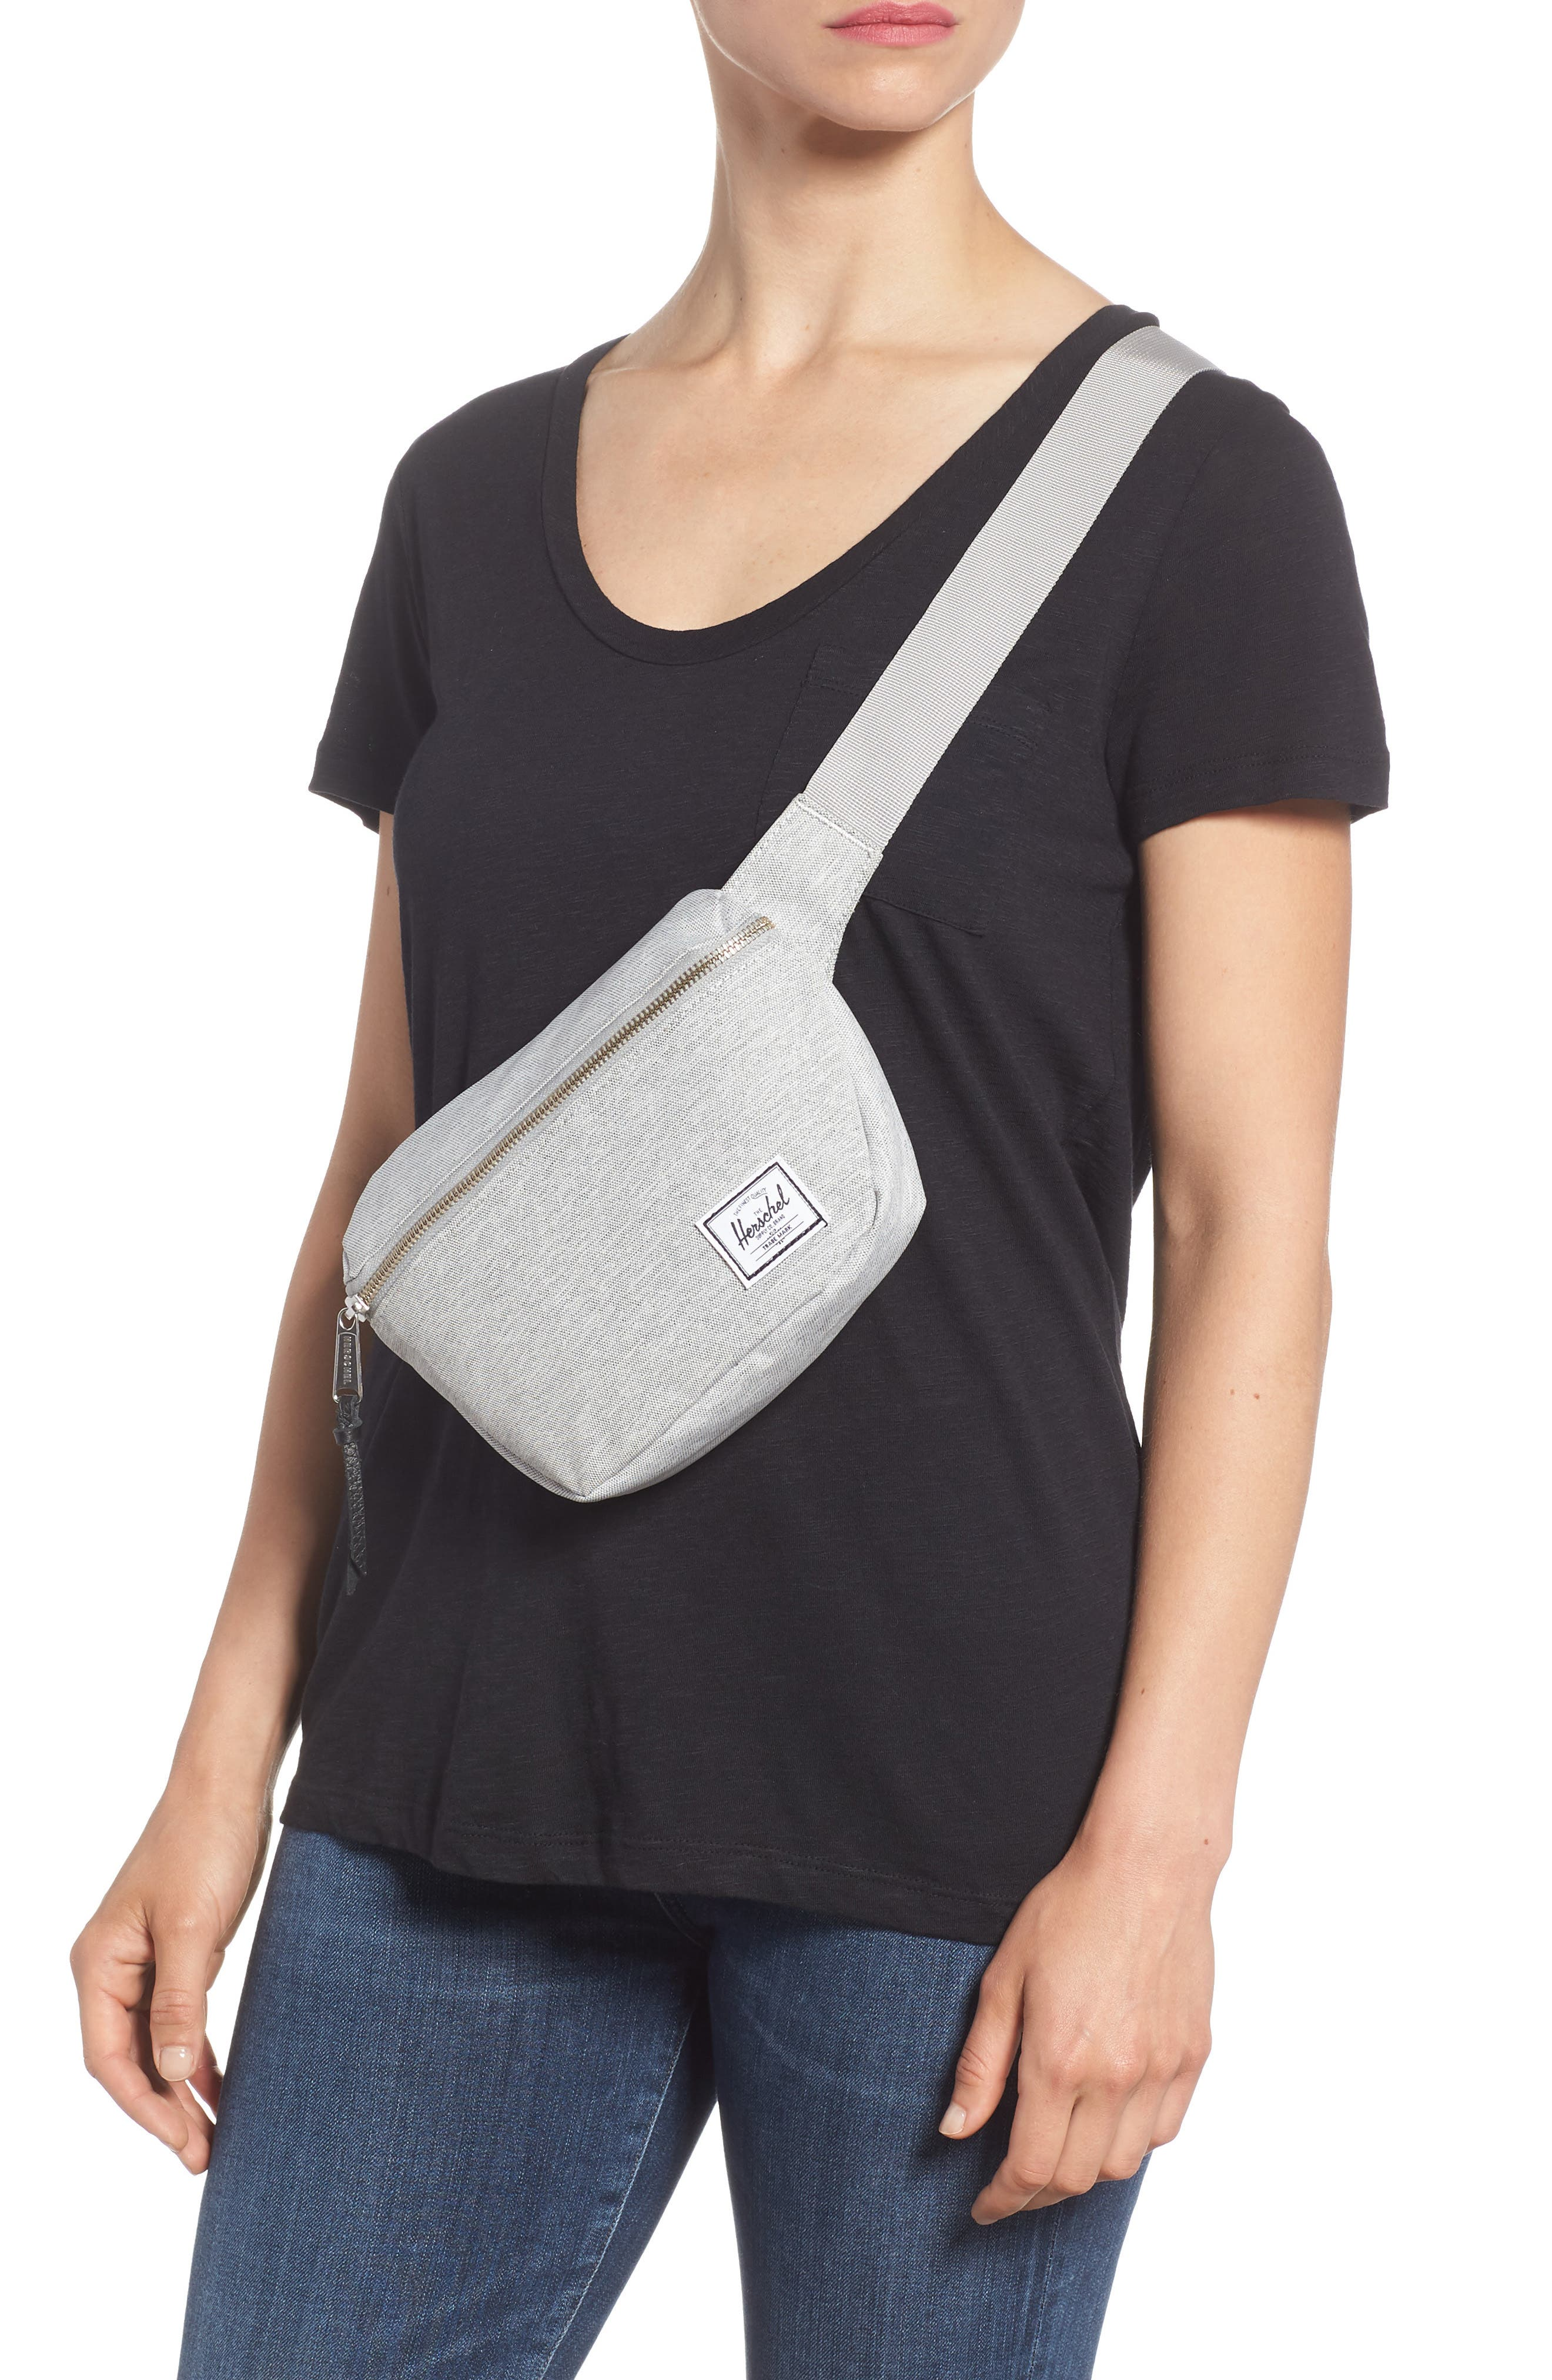 Fifteen Belt Bag,                             Alternate thumbnail 2, color,                             Light Grey